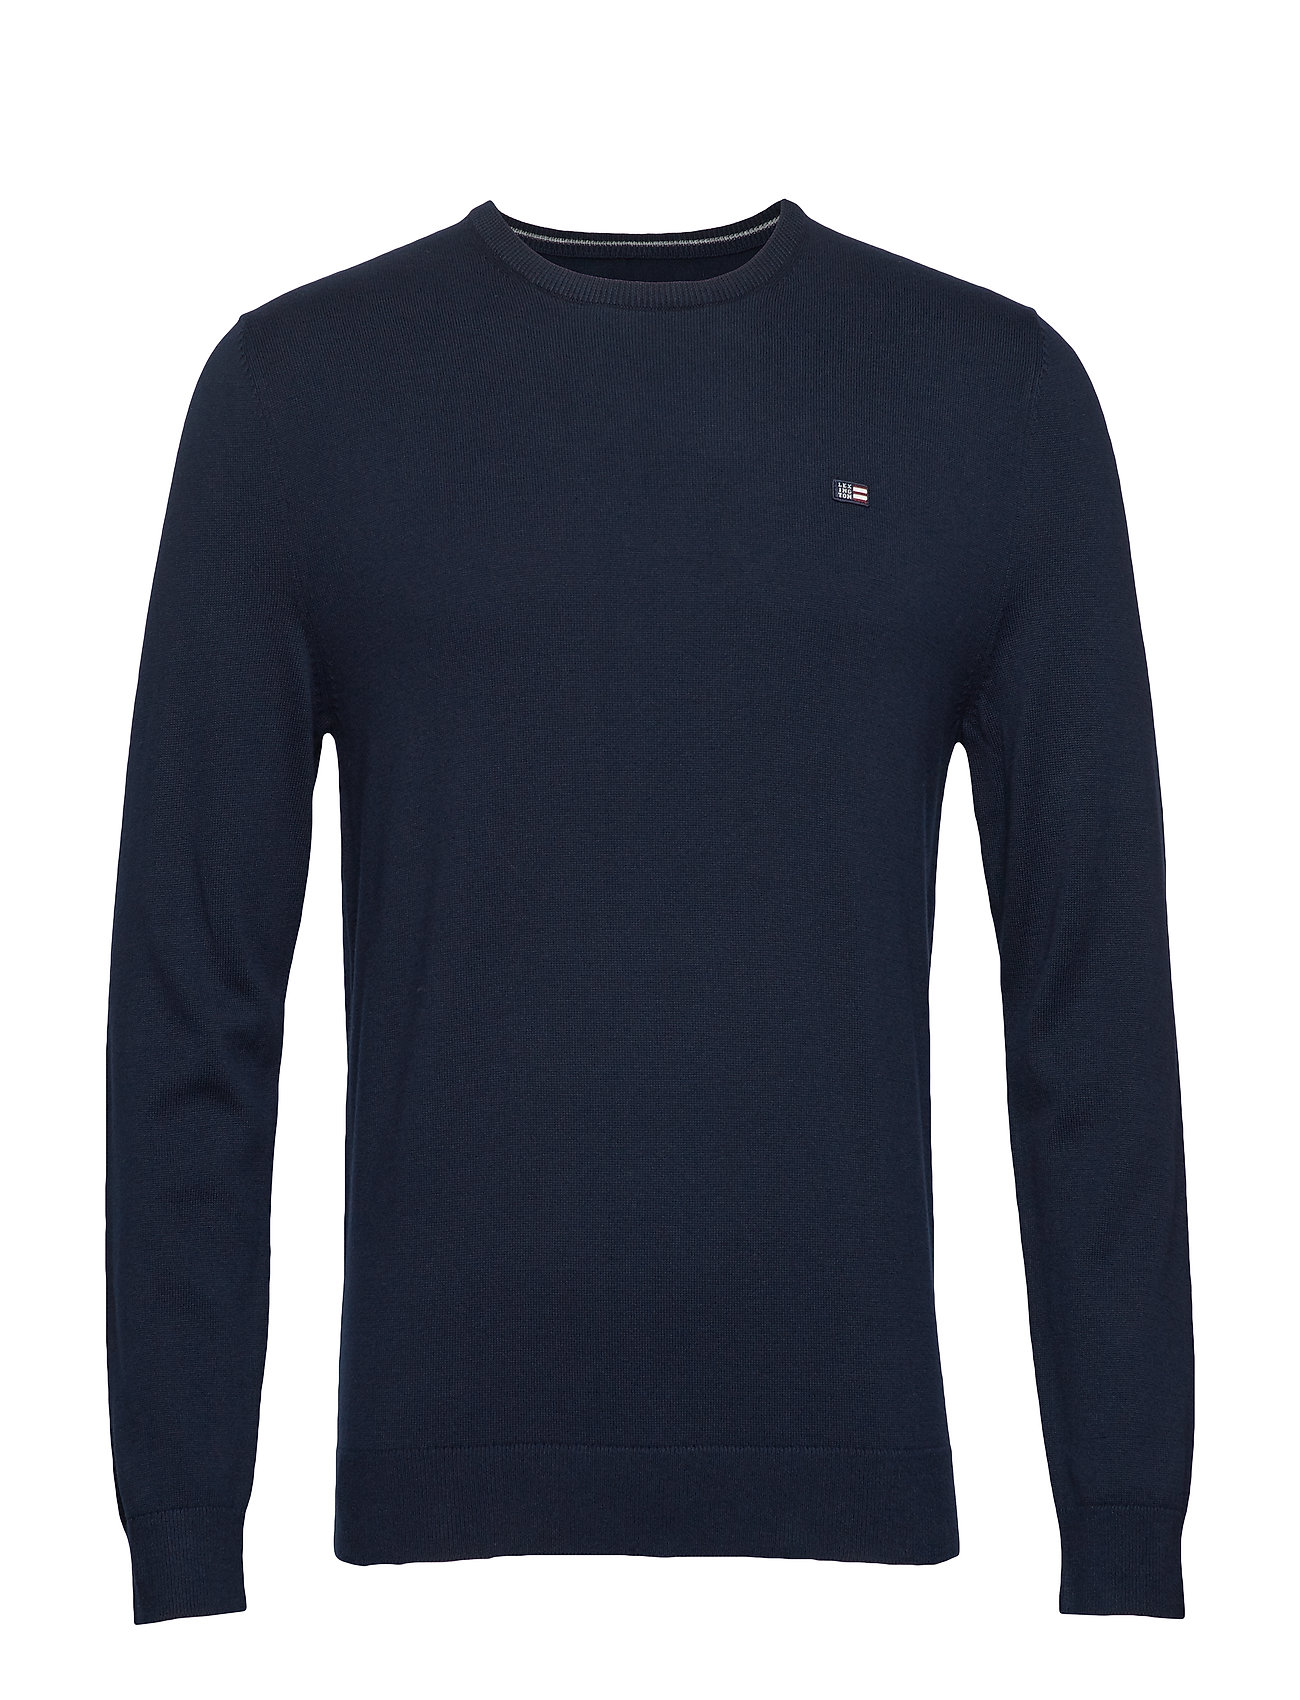 Lexington Clothing Bradley Crew Neck Sweater - DARK BLUE